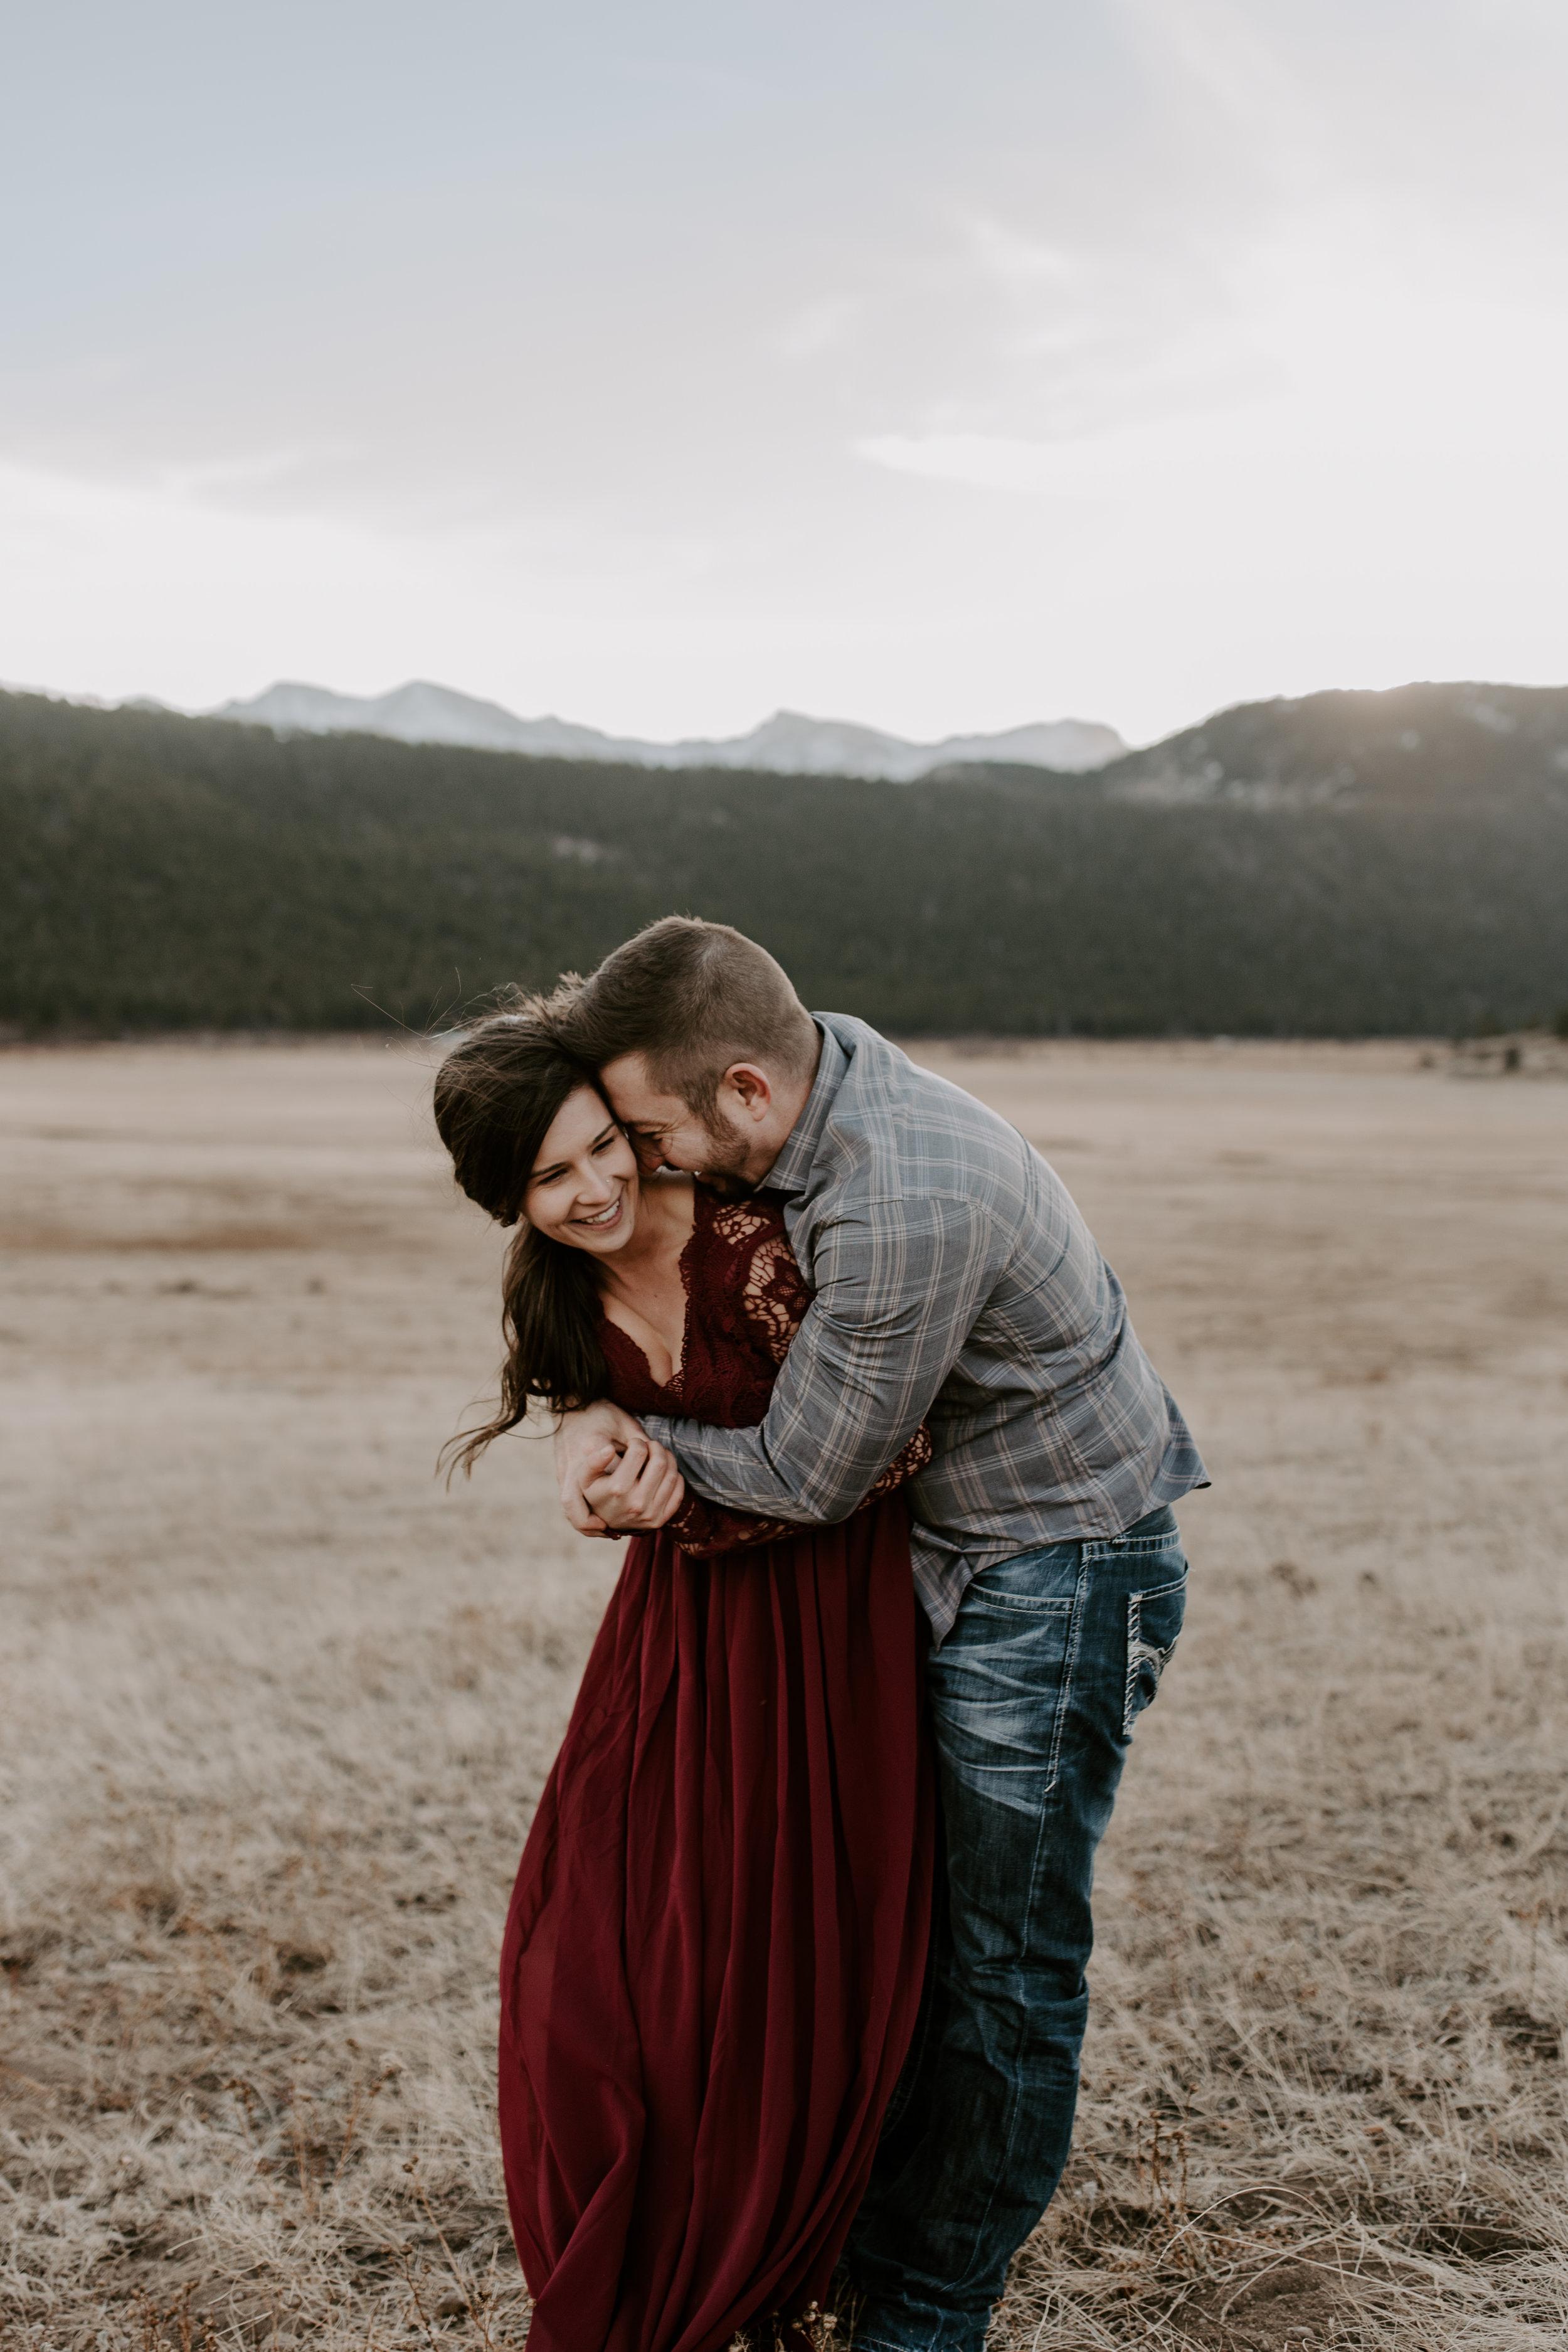 Denver, Colorado based adventure elopement and wedding photographer.